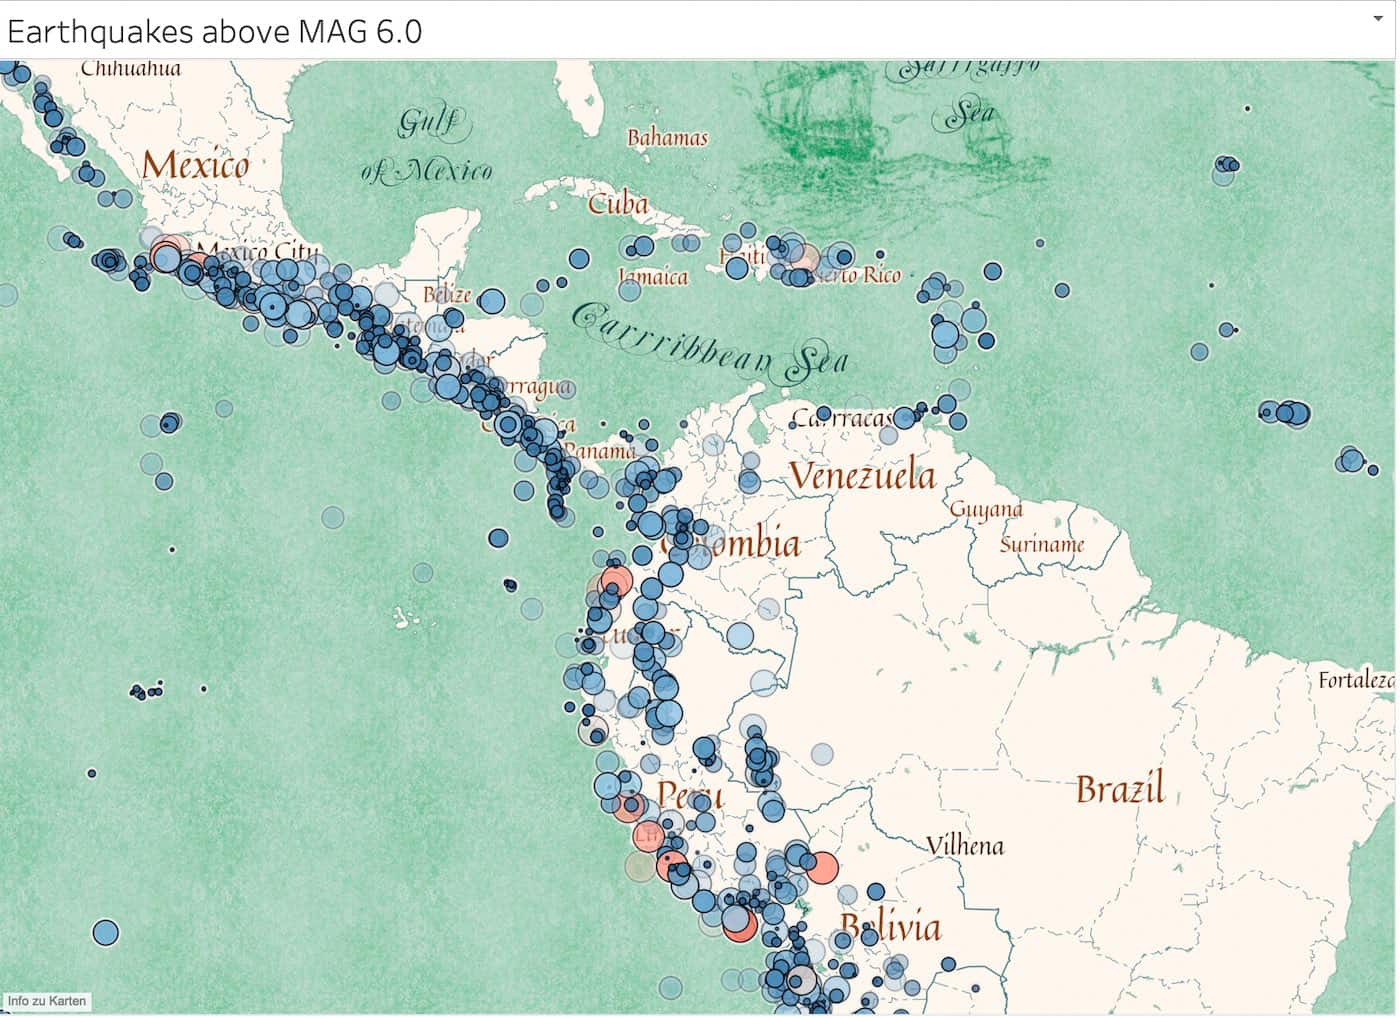 Integrated Mapbox Tableau Visualization